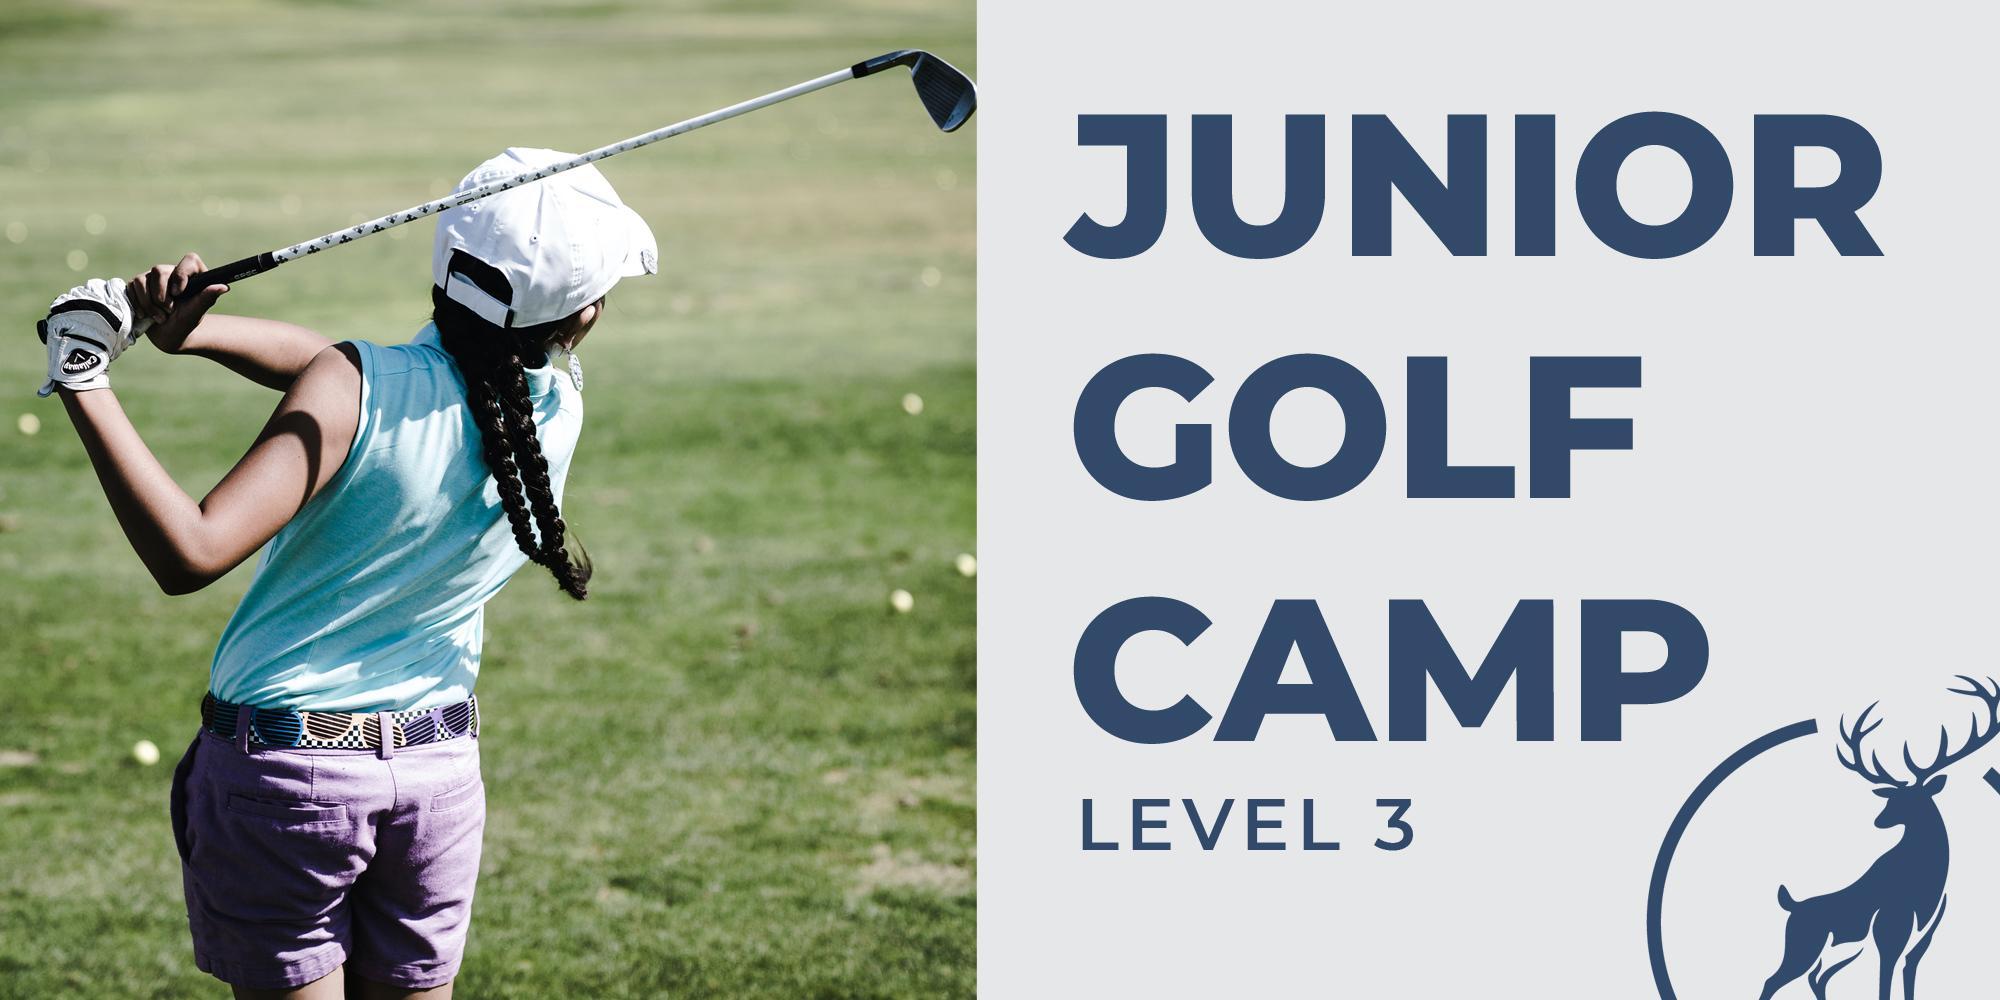 4 Day Junior Golf Camp - $135 - Level 3